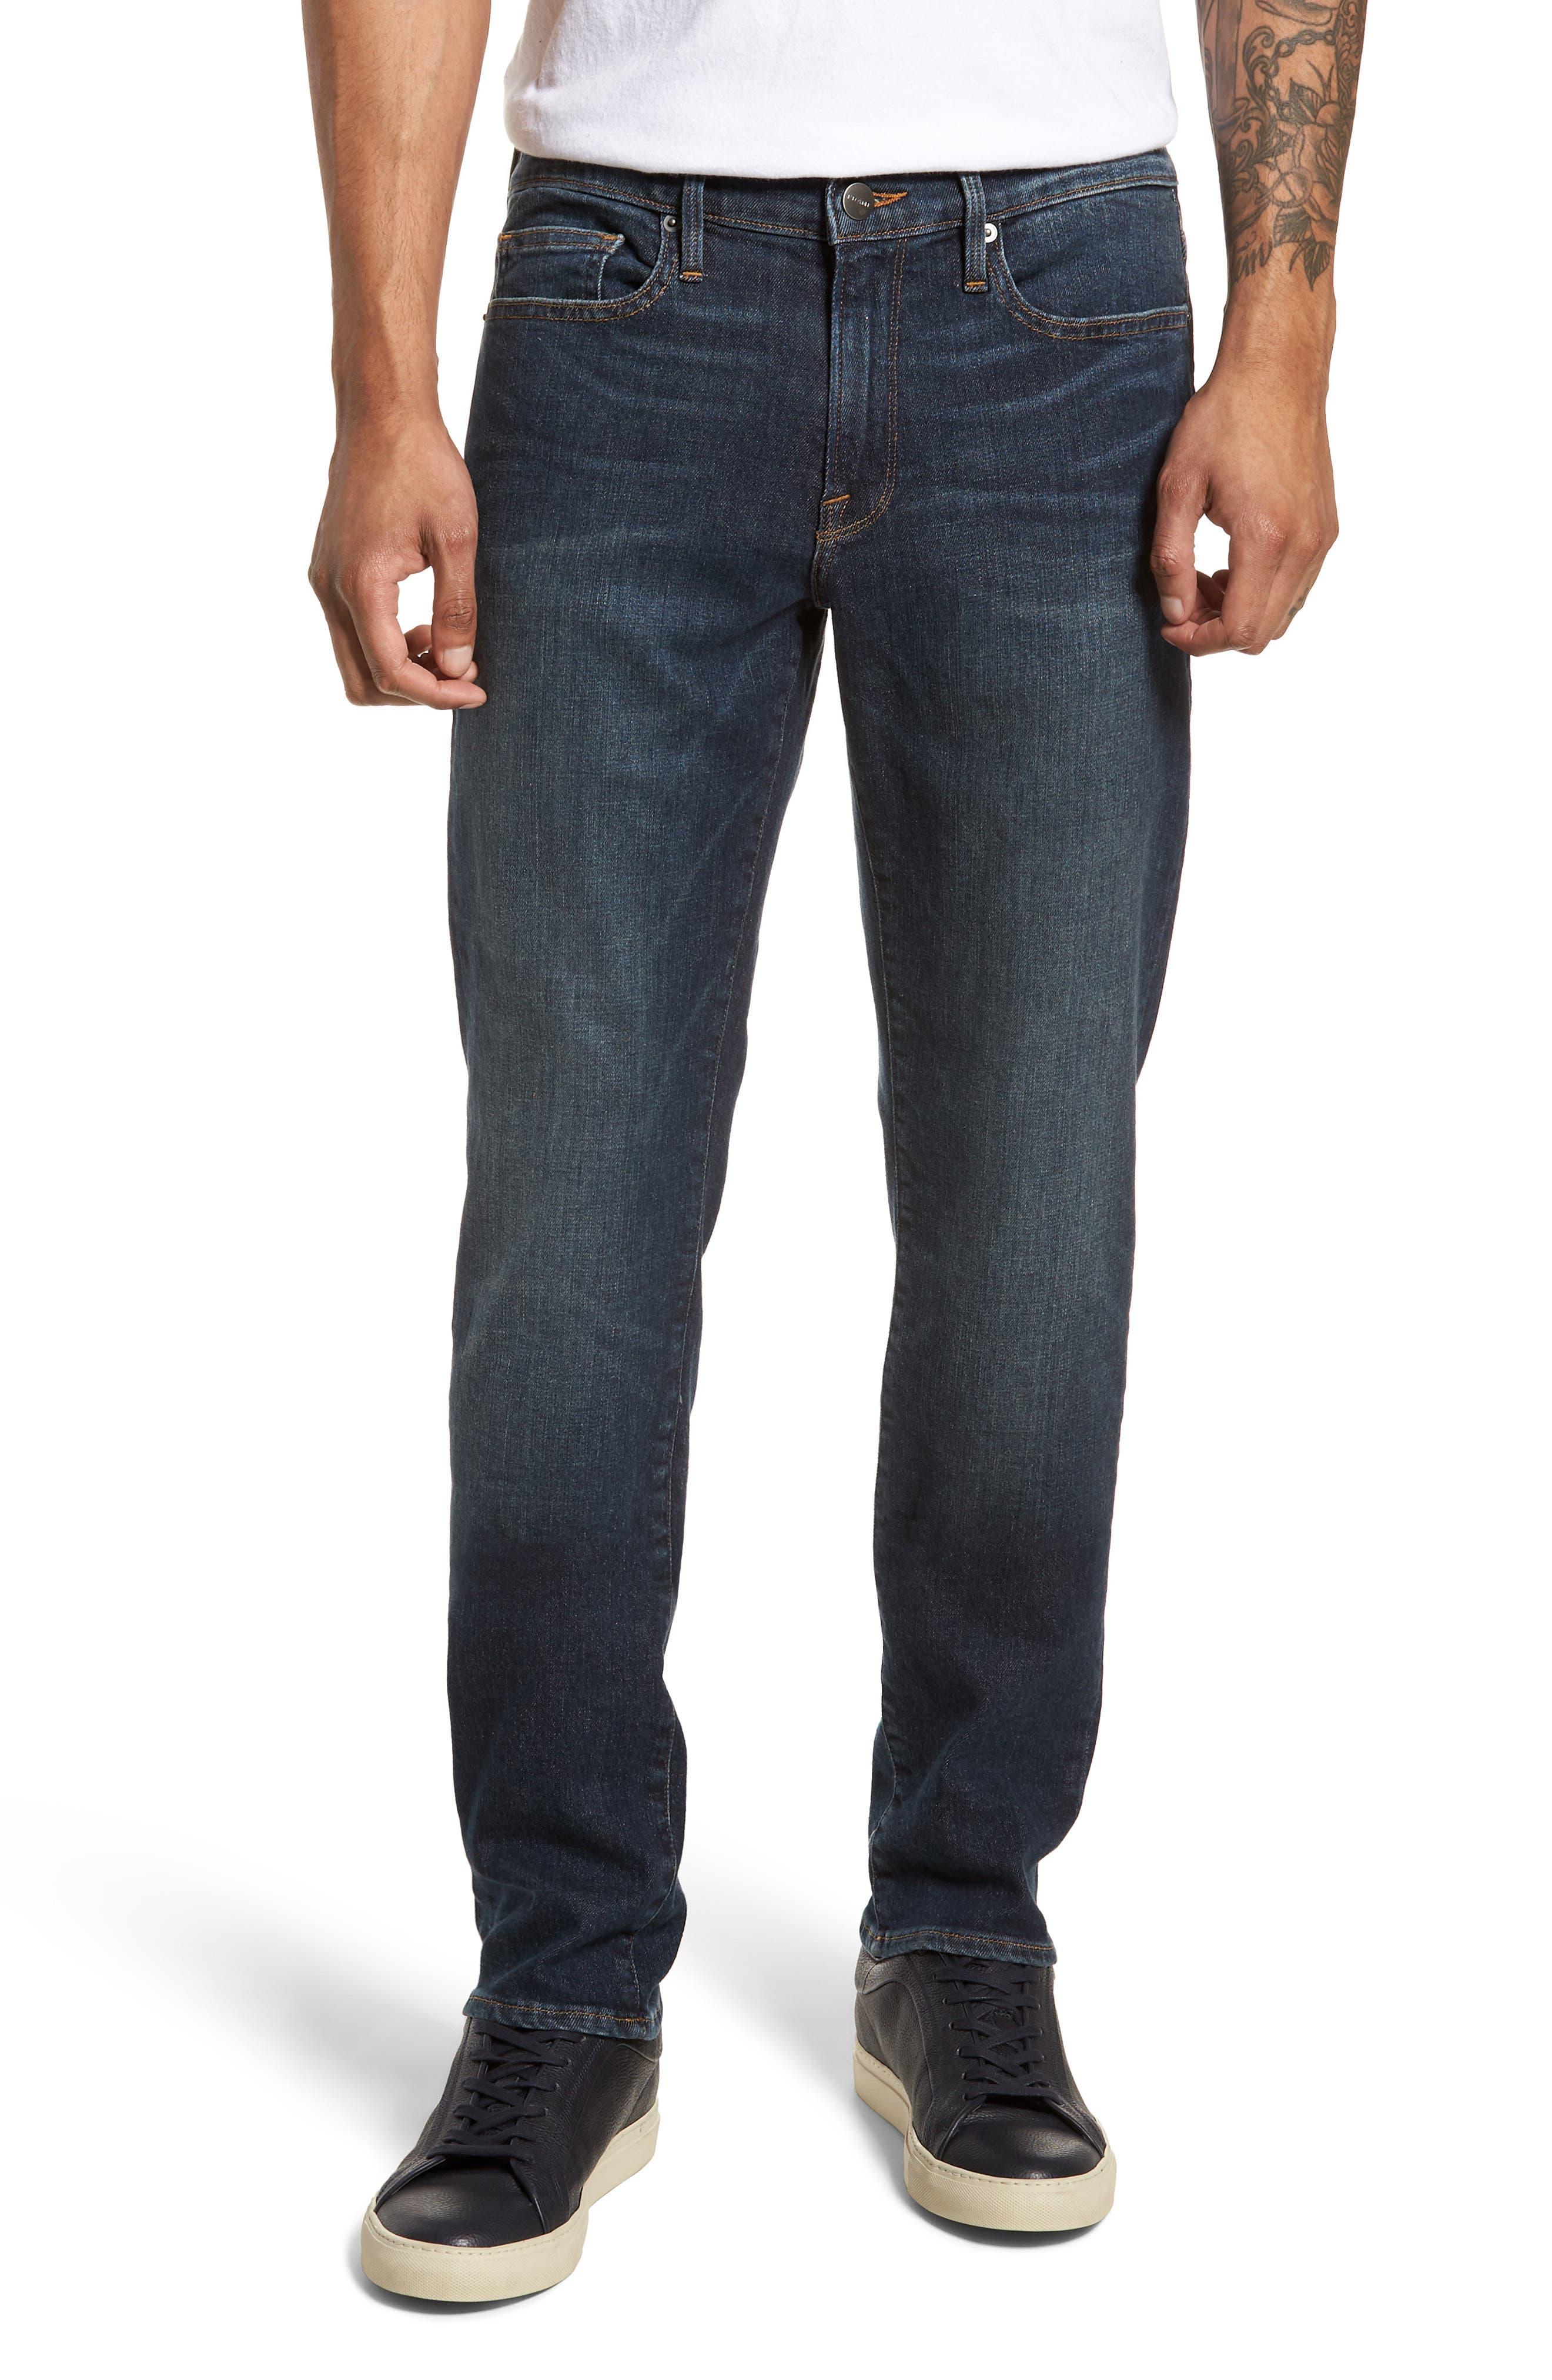 L'Homme Slim Fit Jeans,                         Main,                         color, JOSHUA TREE